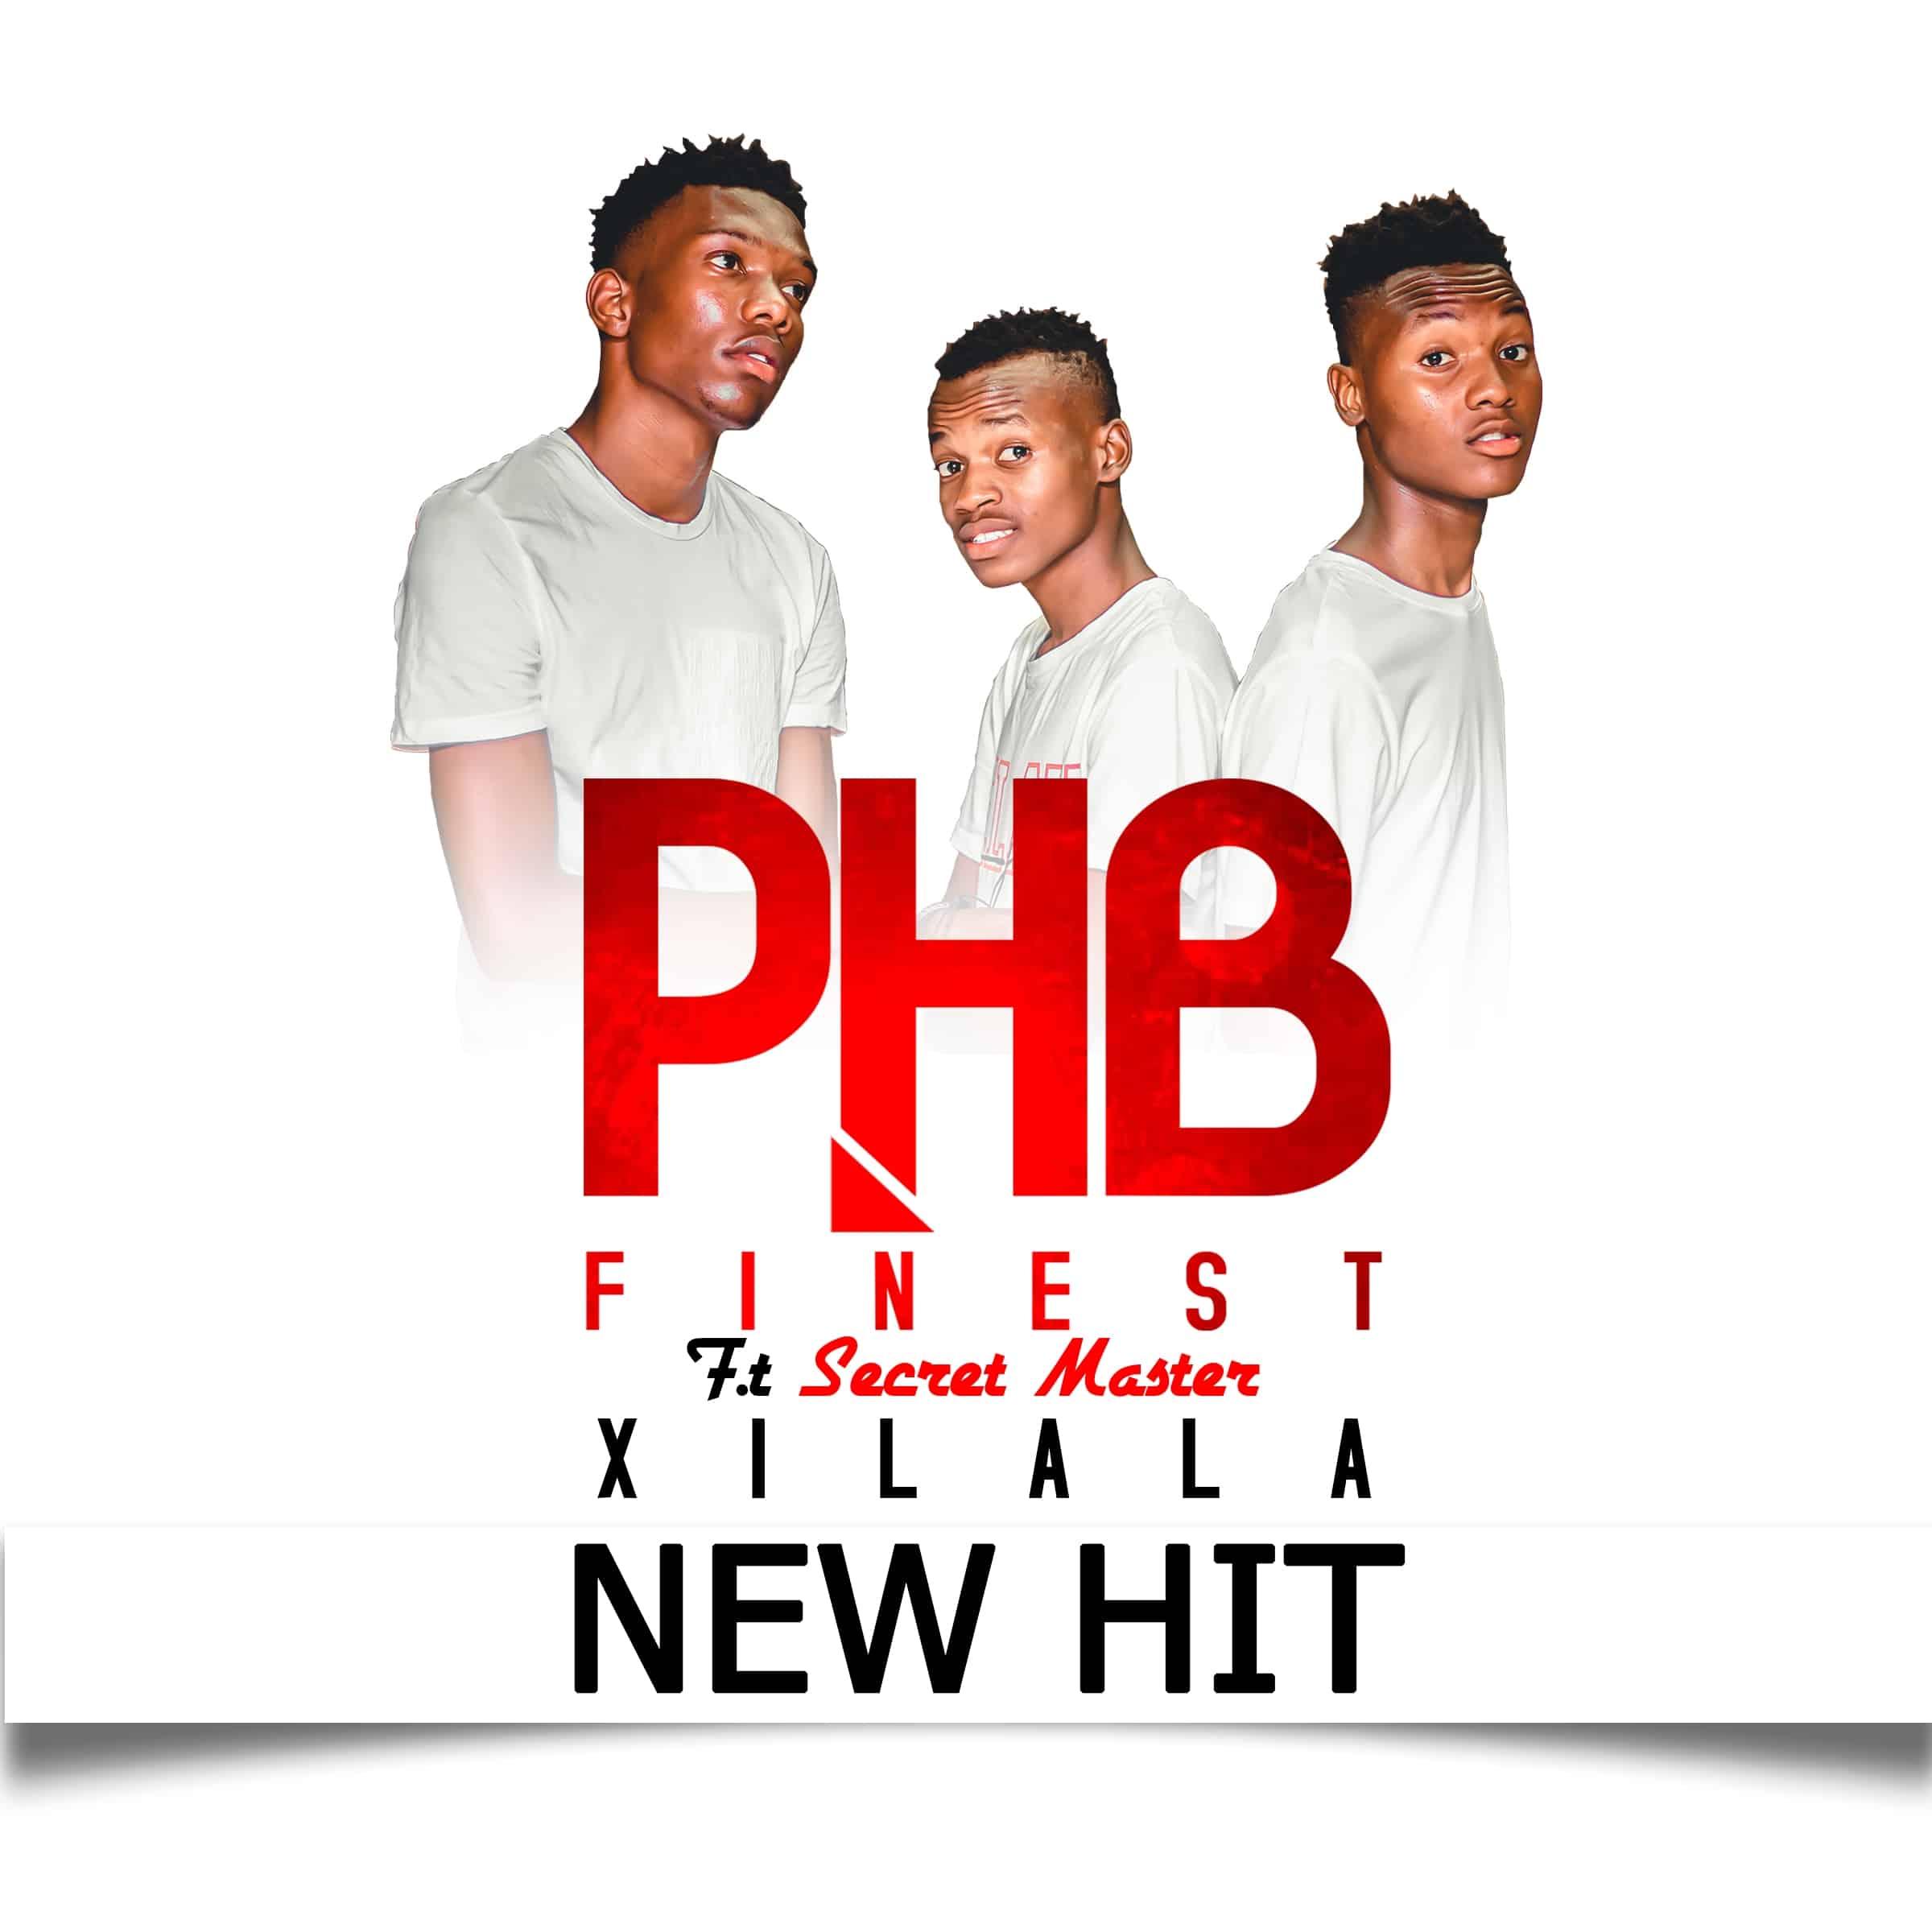 PHB Finest ft Secret Master - Xilala